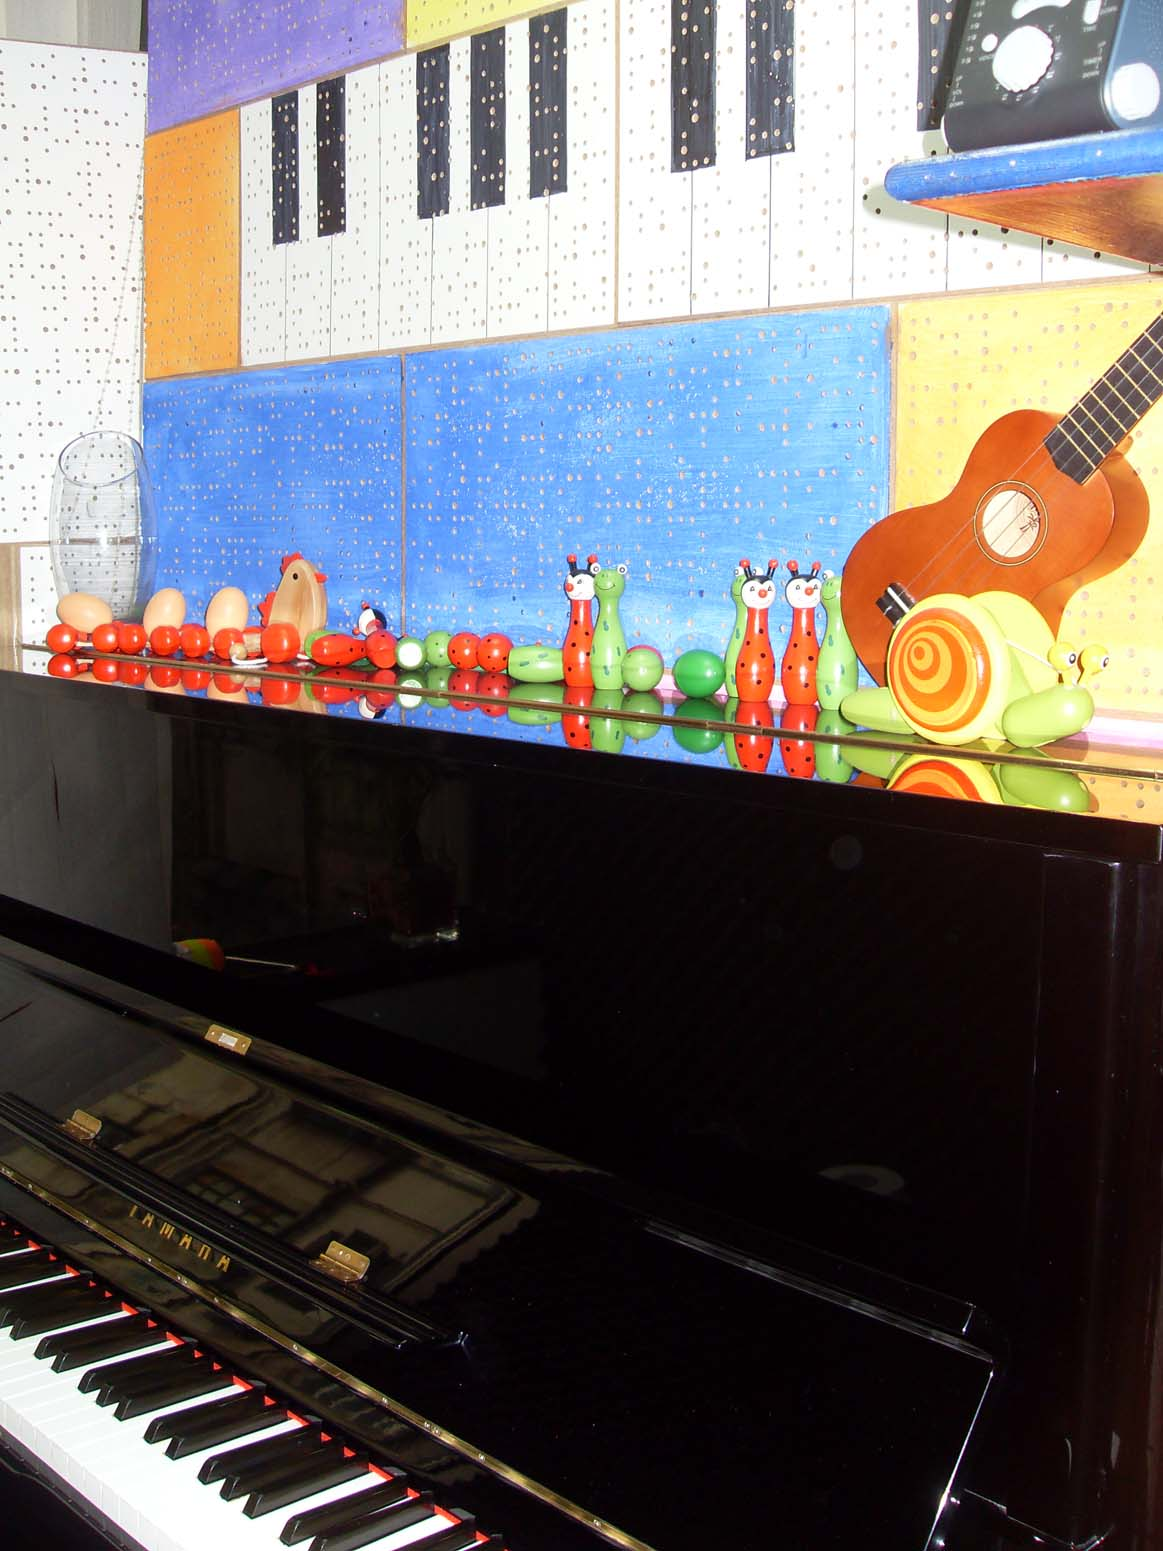 technology,piano,